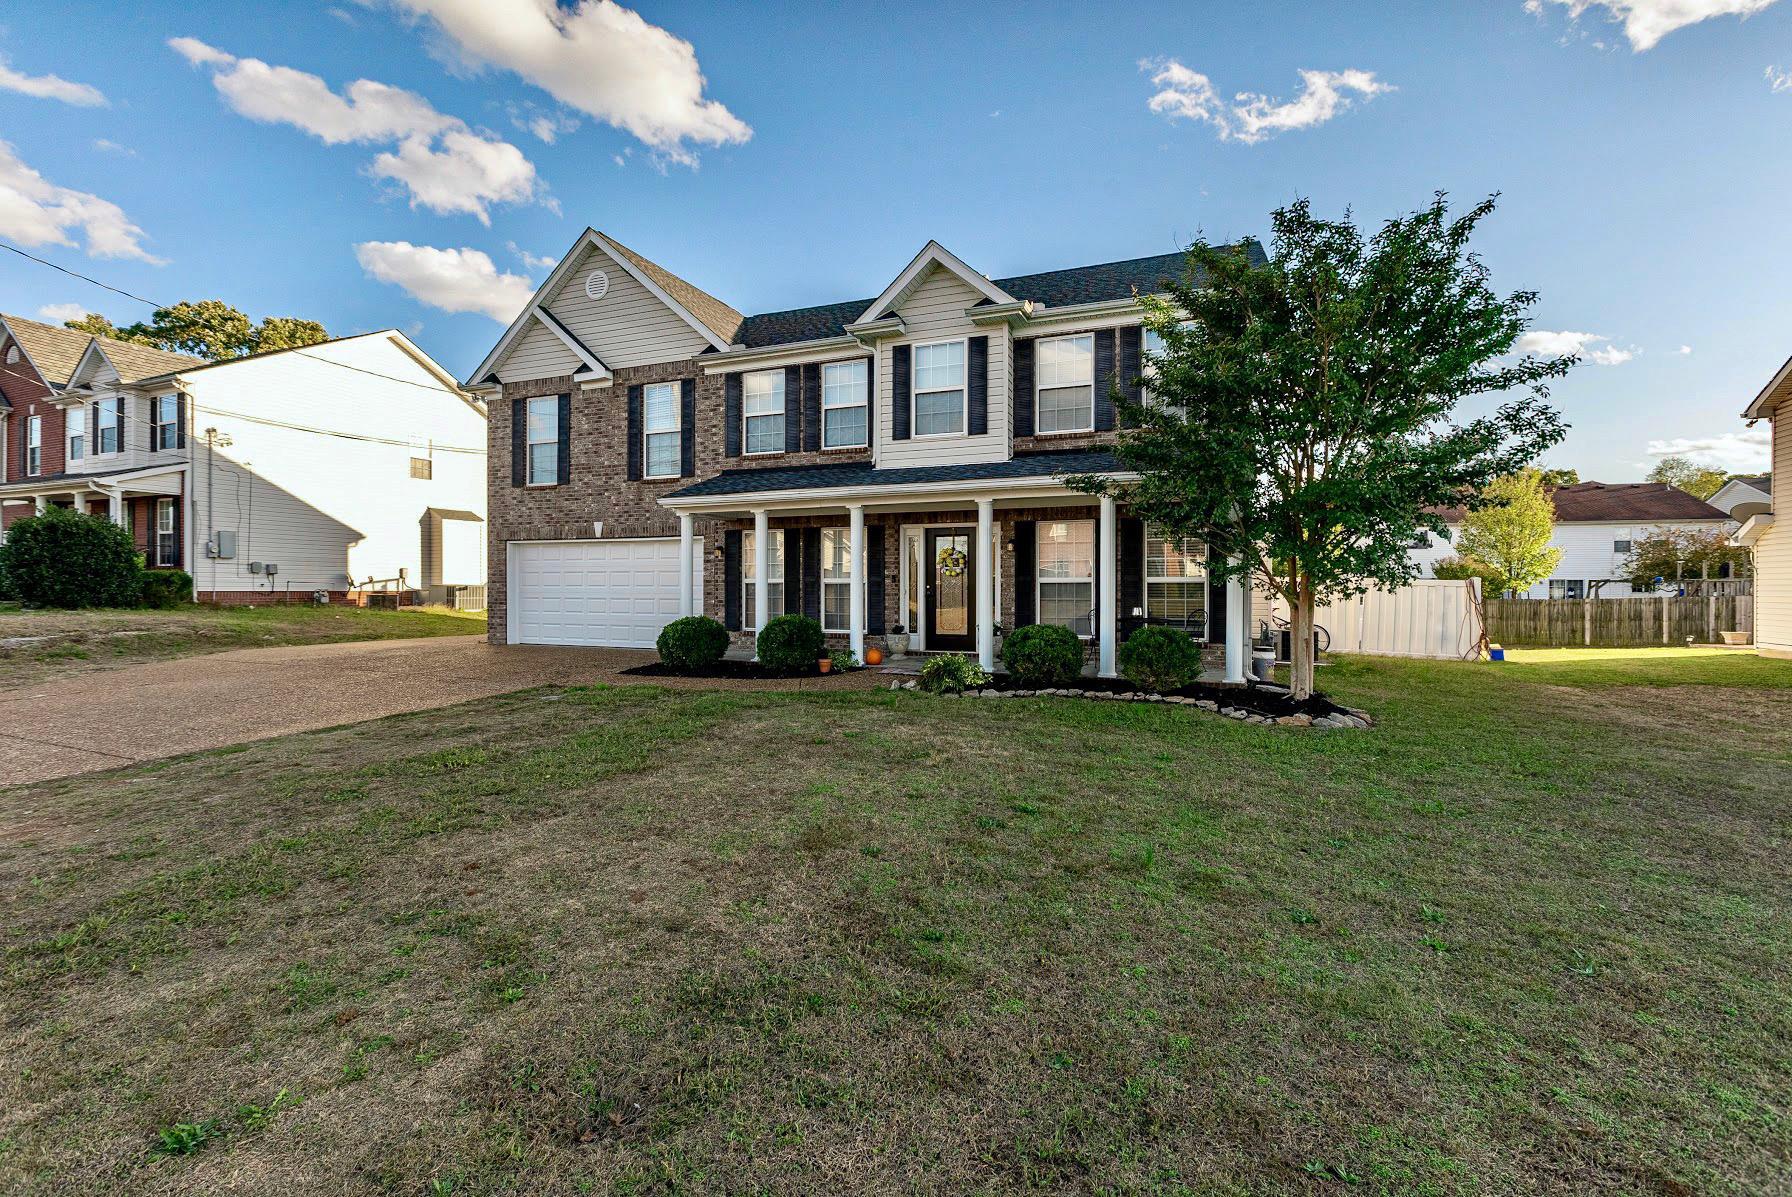 305 John Henry Dr, LA VERGNE, TN 37086 - LA VERGNE, TN real estate listing